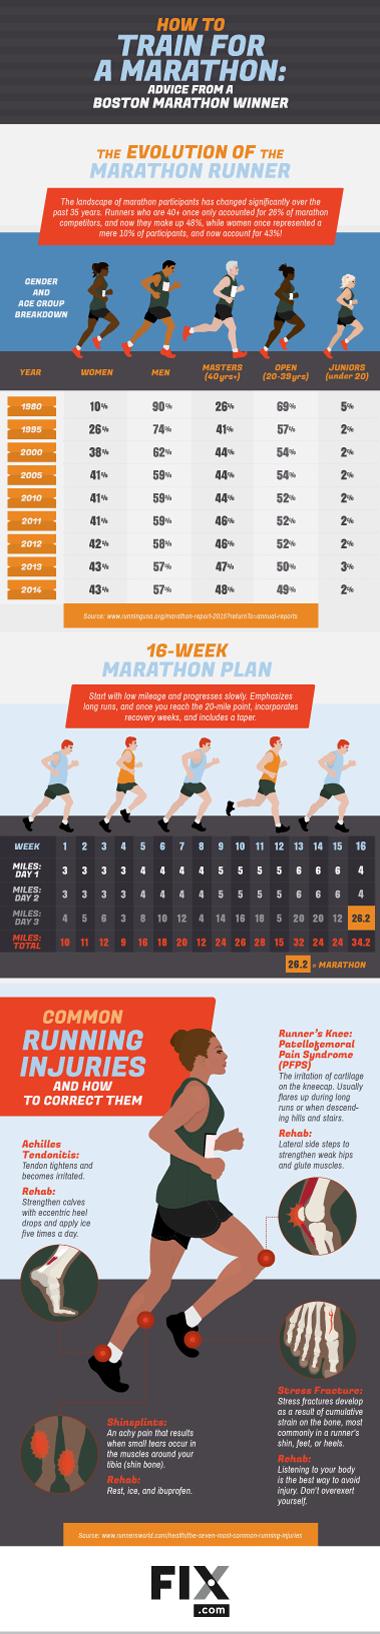 marathon-training-embed-small